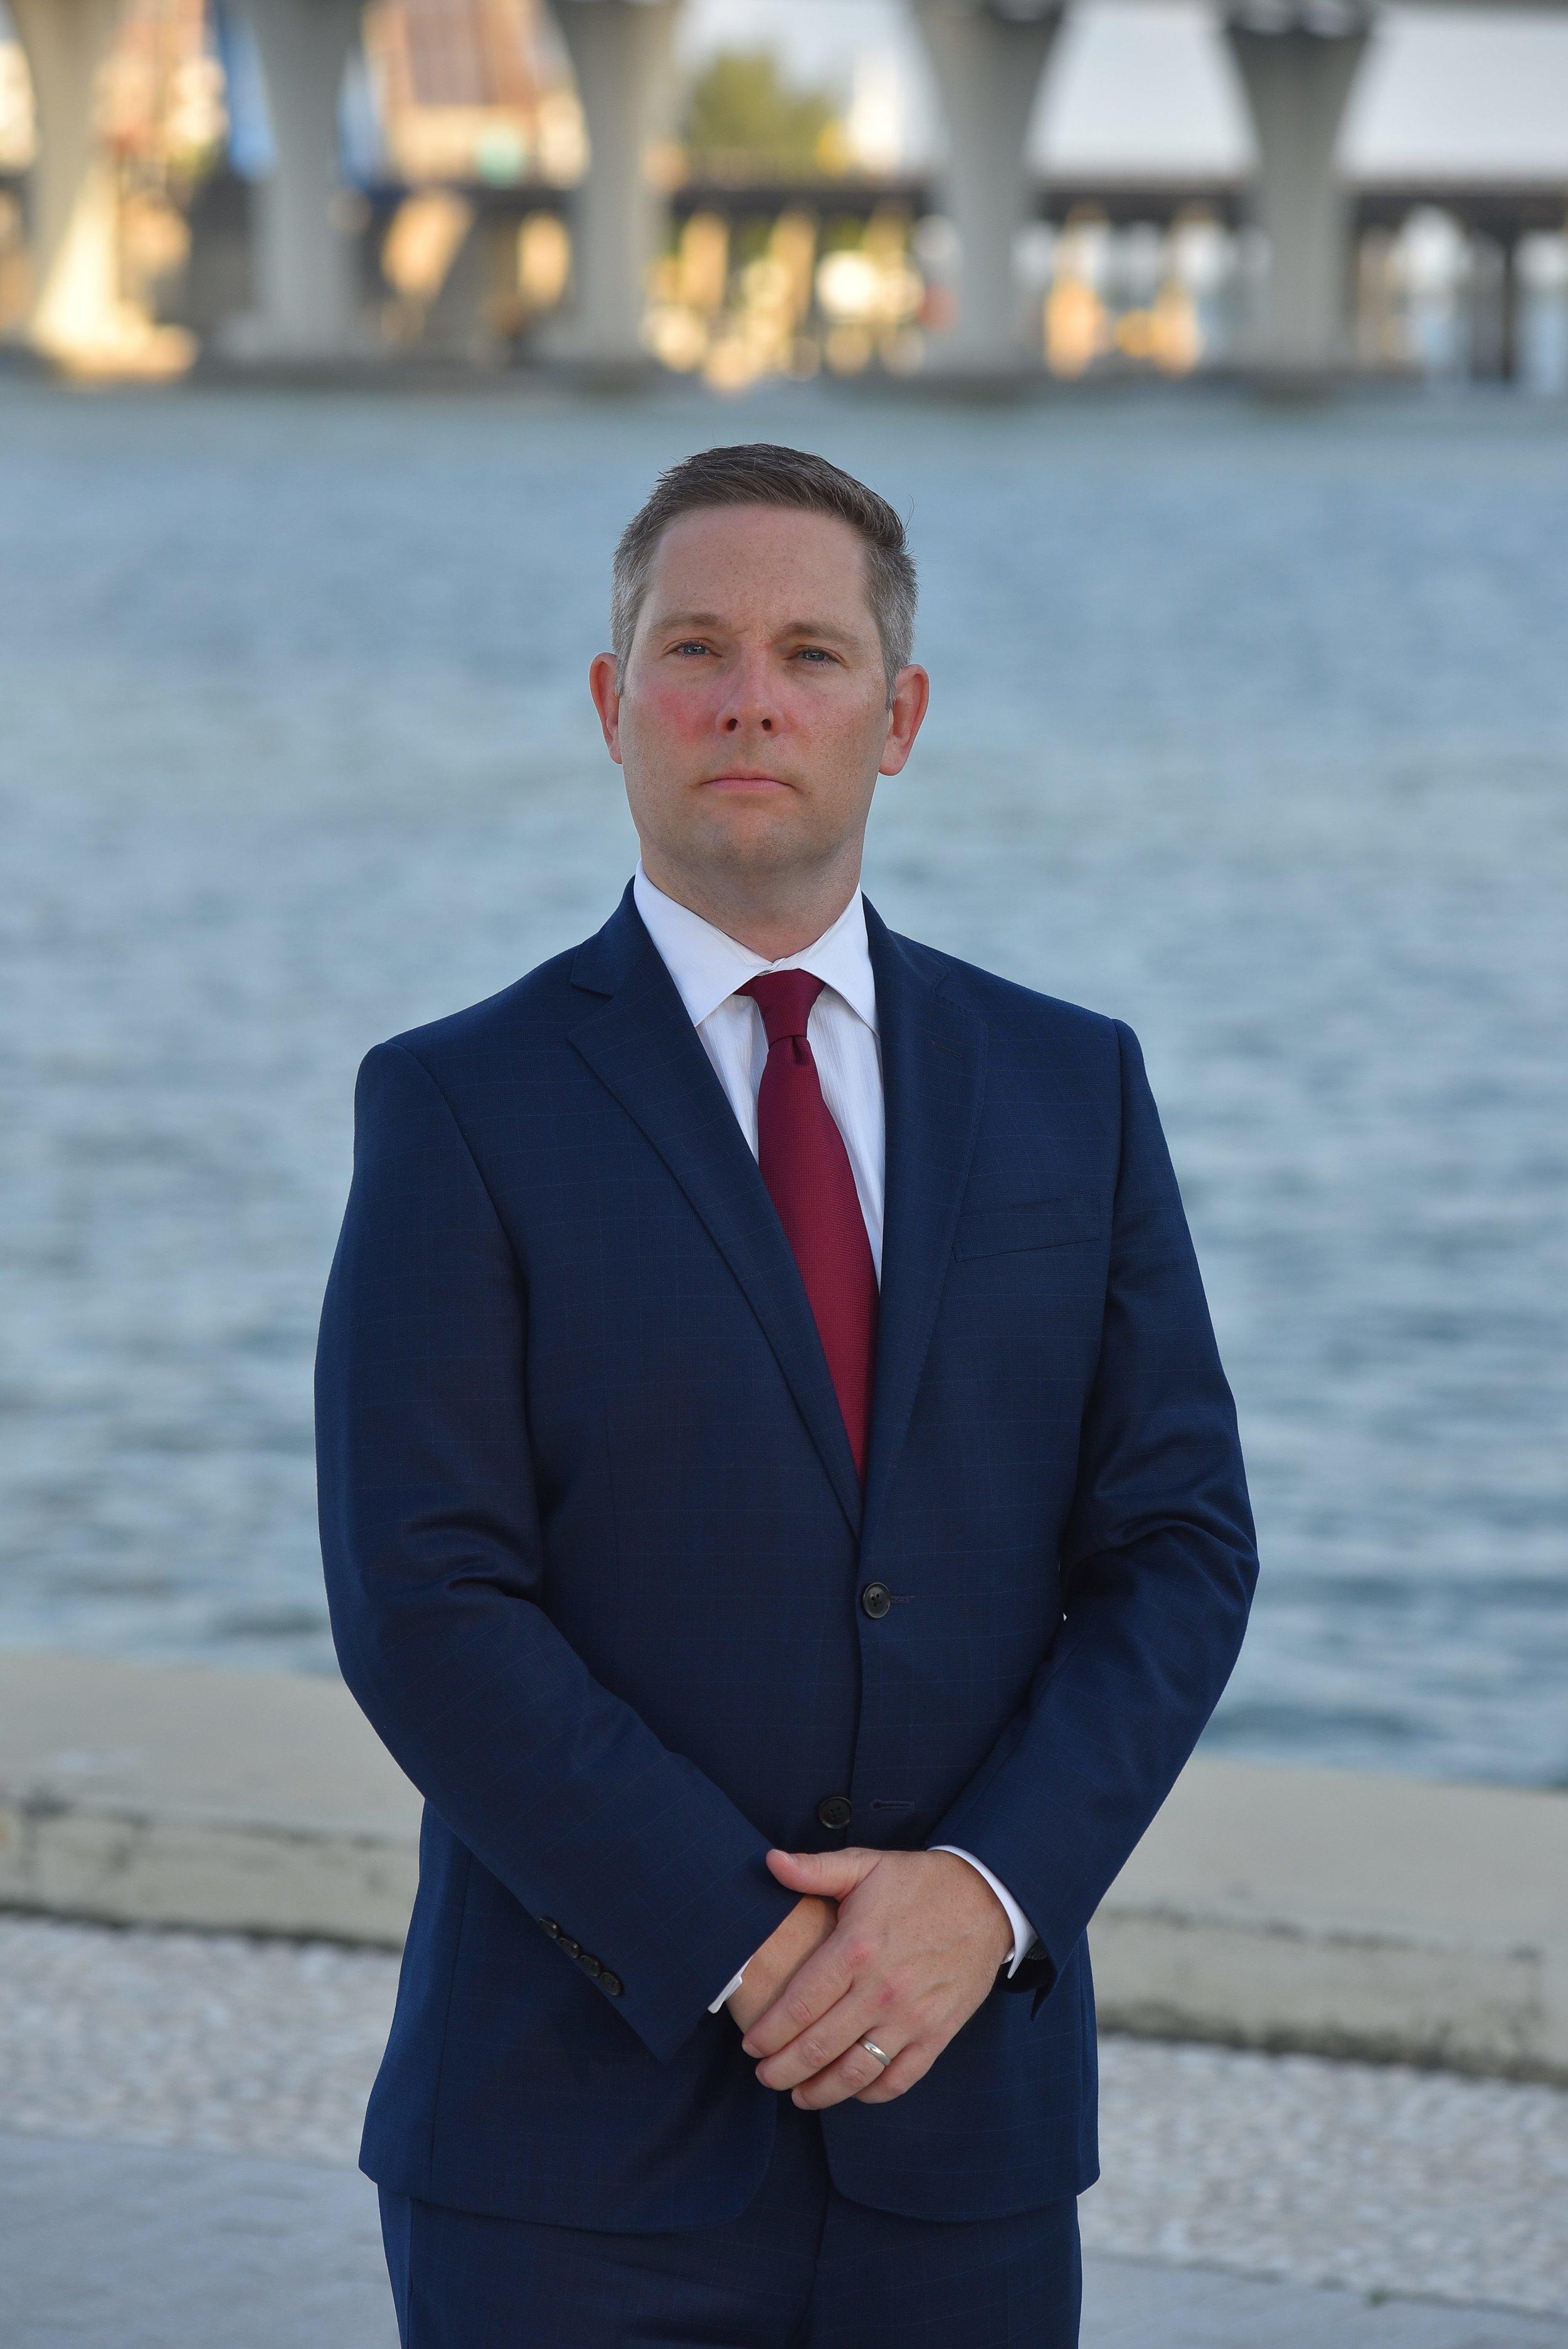 Charles Zimmerer, Esq., CPA - Wealth Advisor